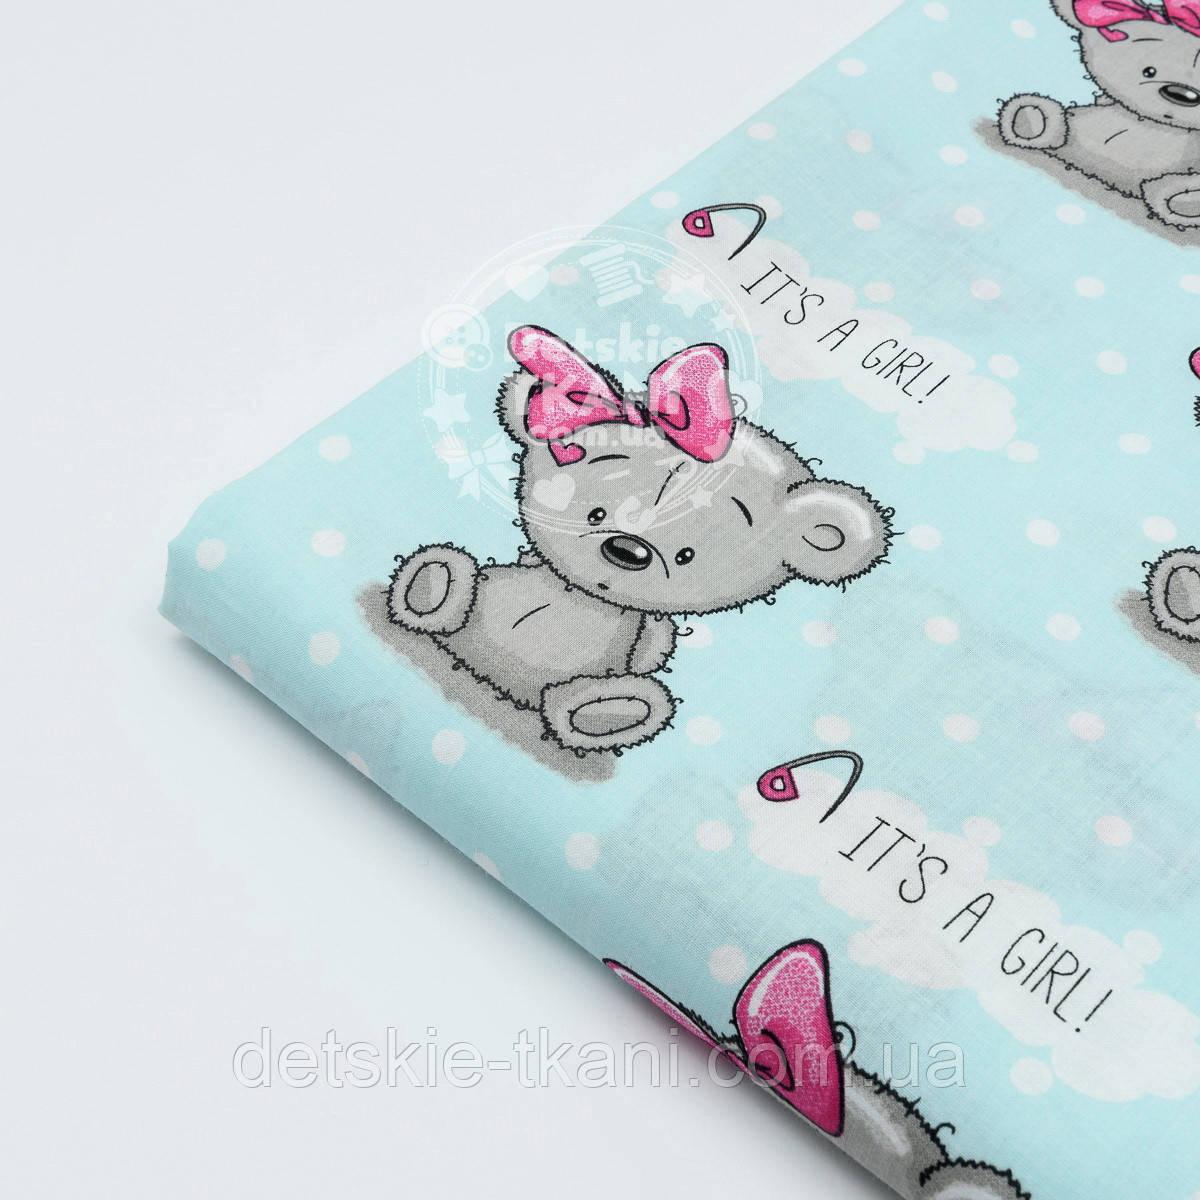 "Лоскут ткани ""Мишки Girl с малиновым бантиком"" на бирюзовом фоне (1595а), размер 36*80 см"